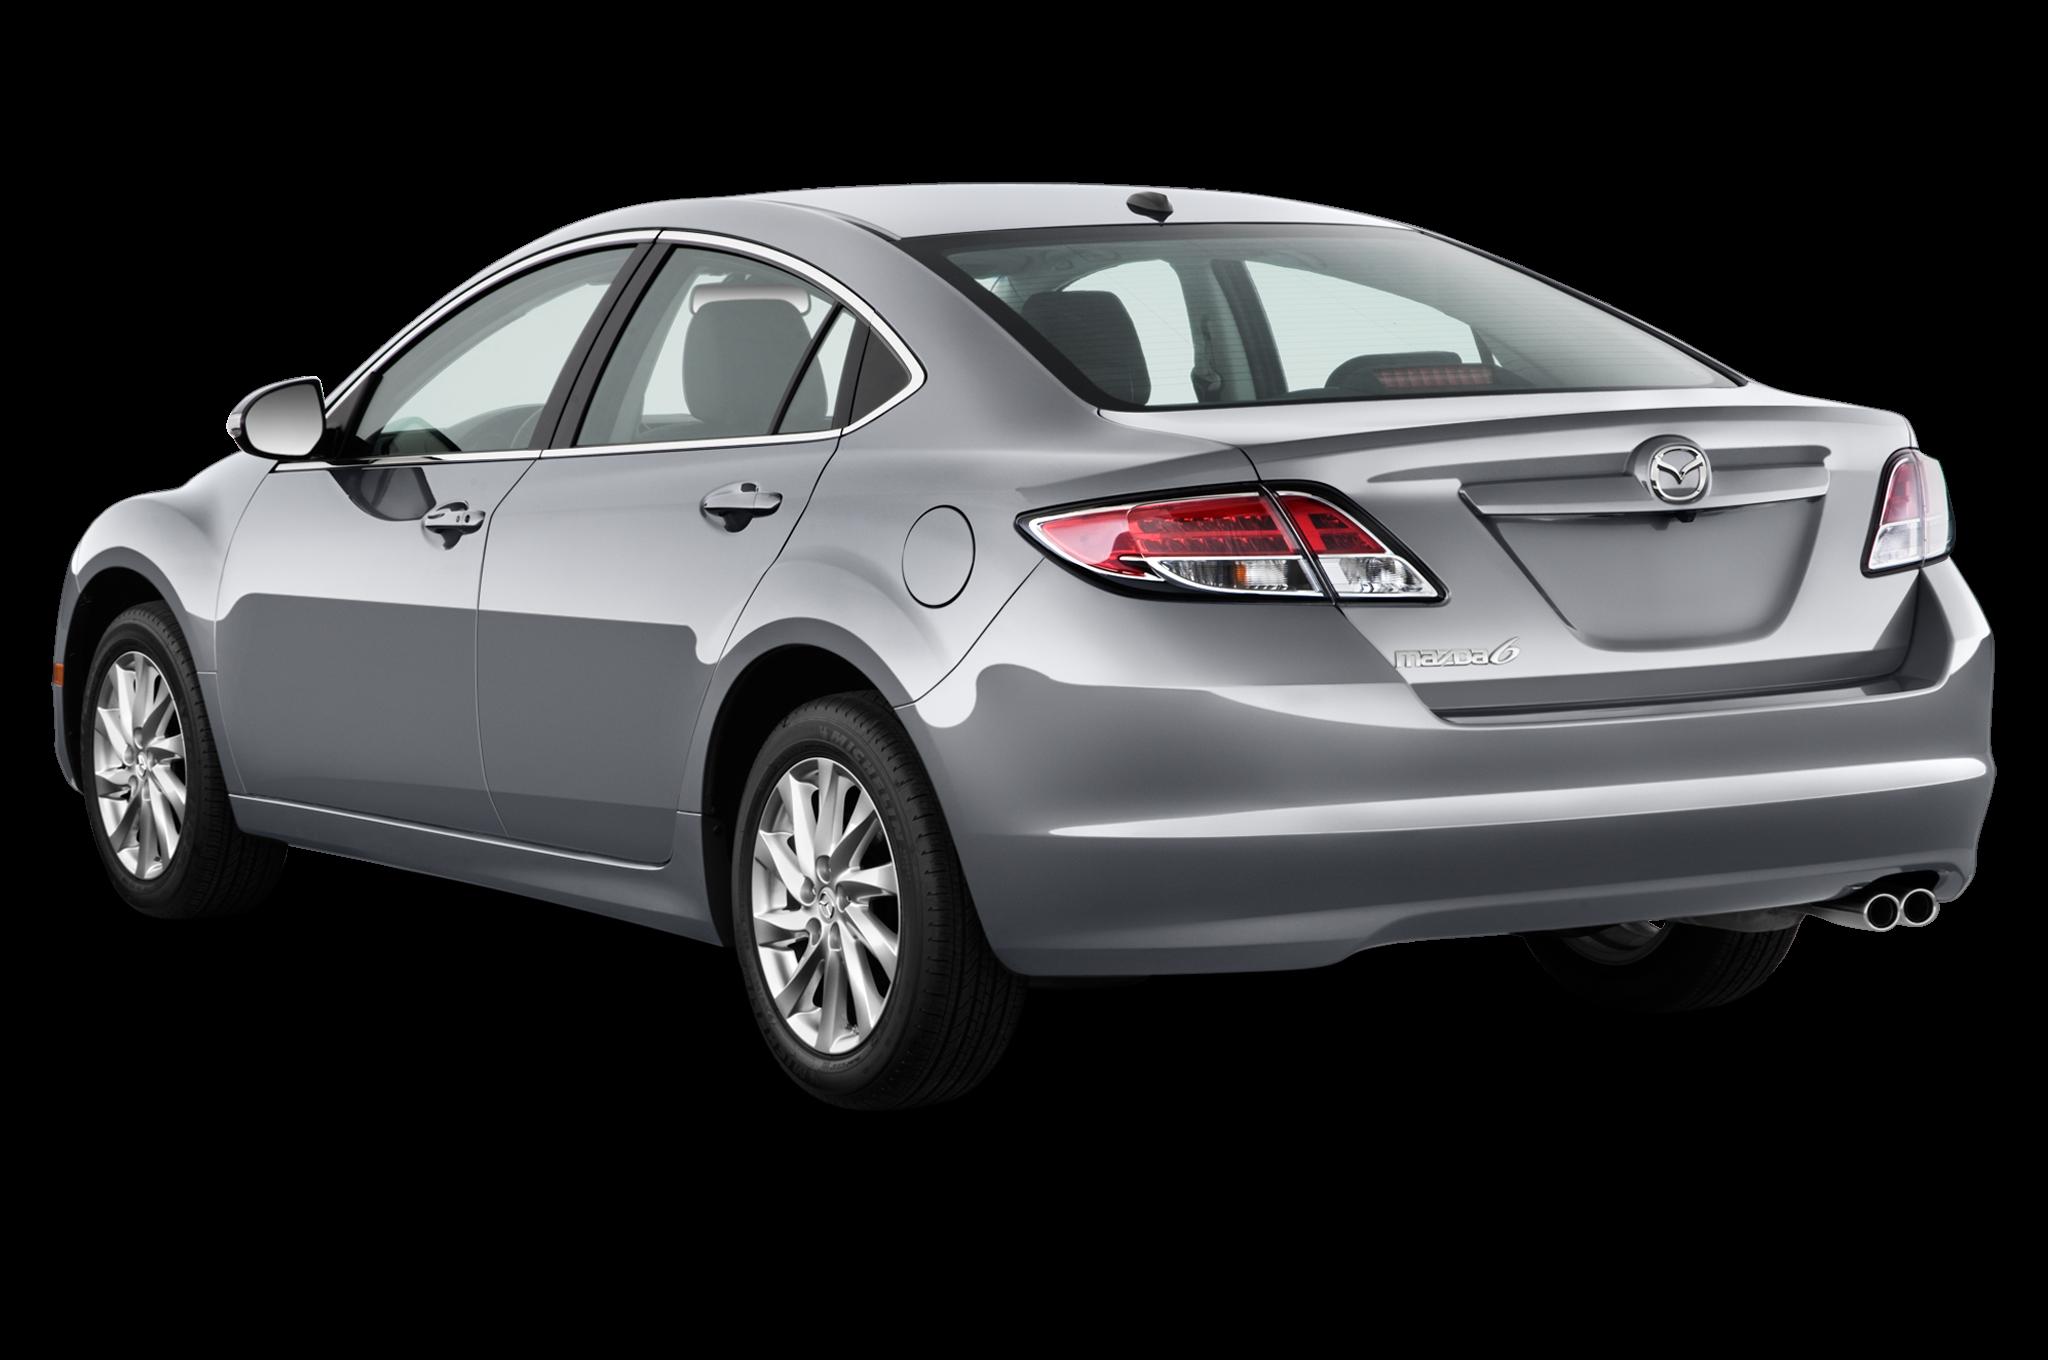 Mazda MAZDA6 I Touring Auto   2012 ( PRICES U0026 SPECS )